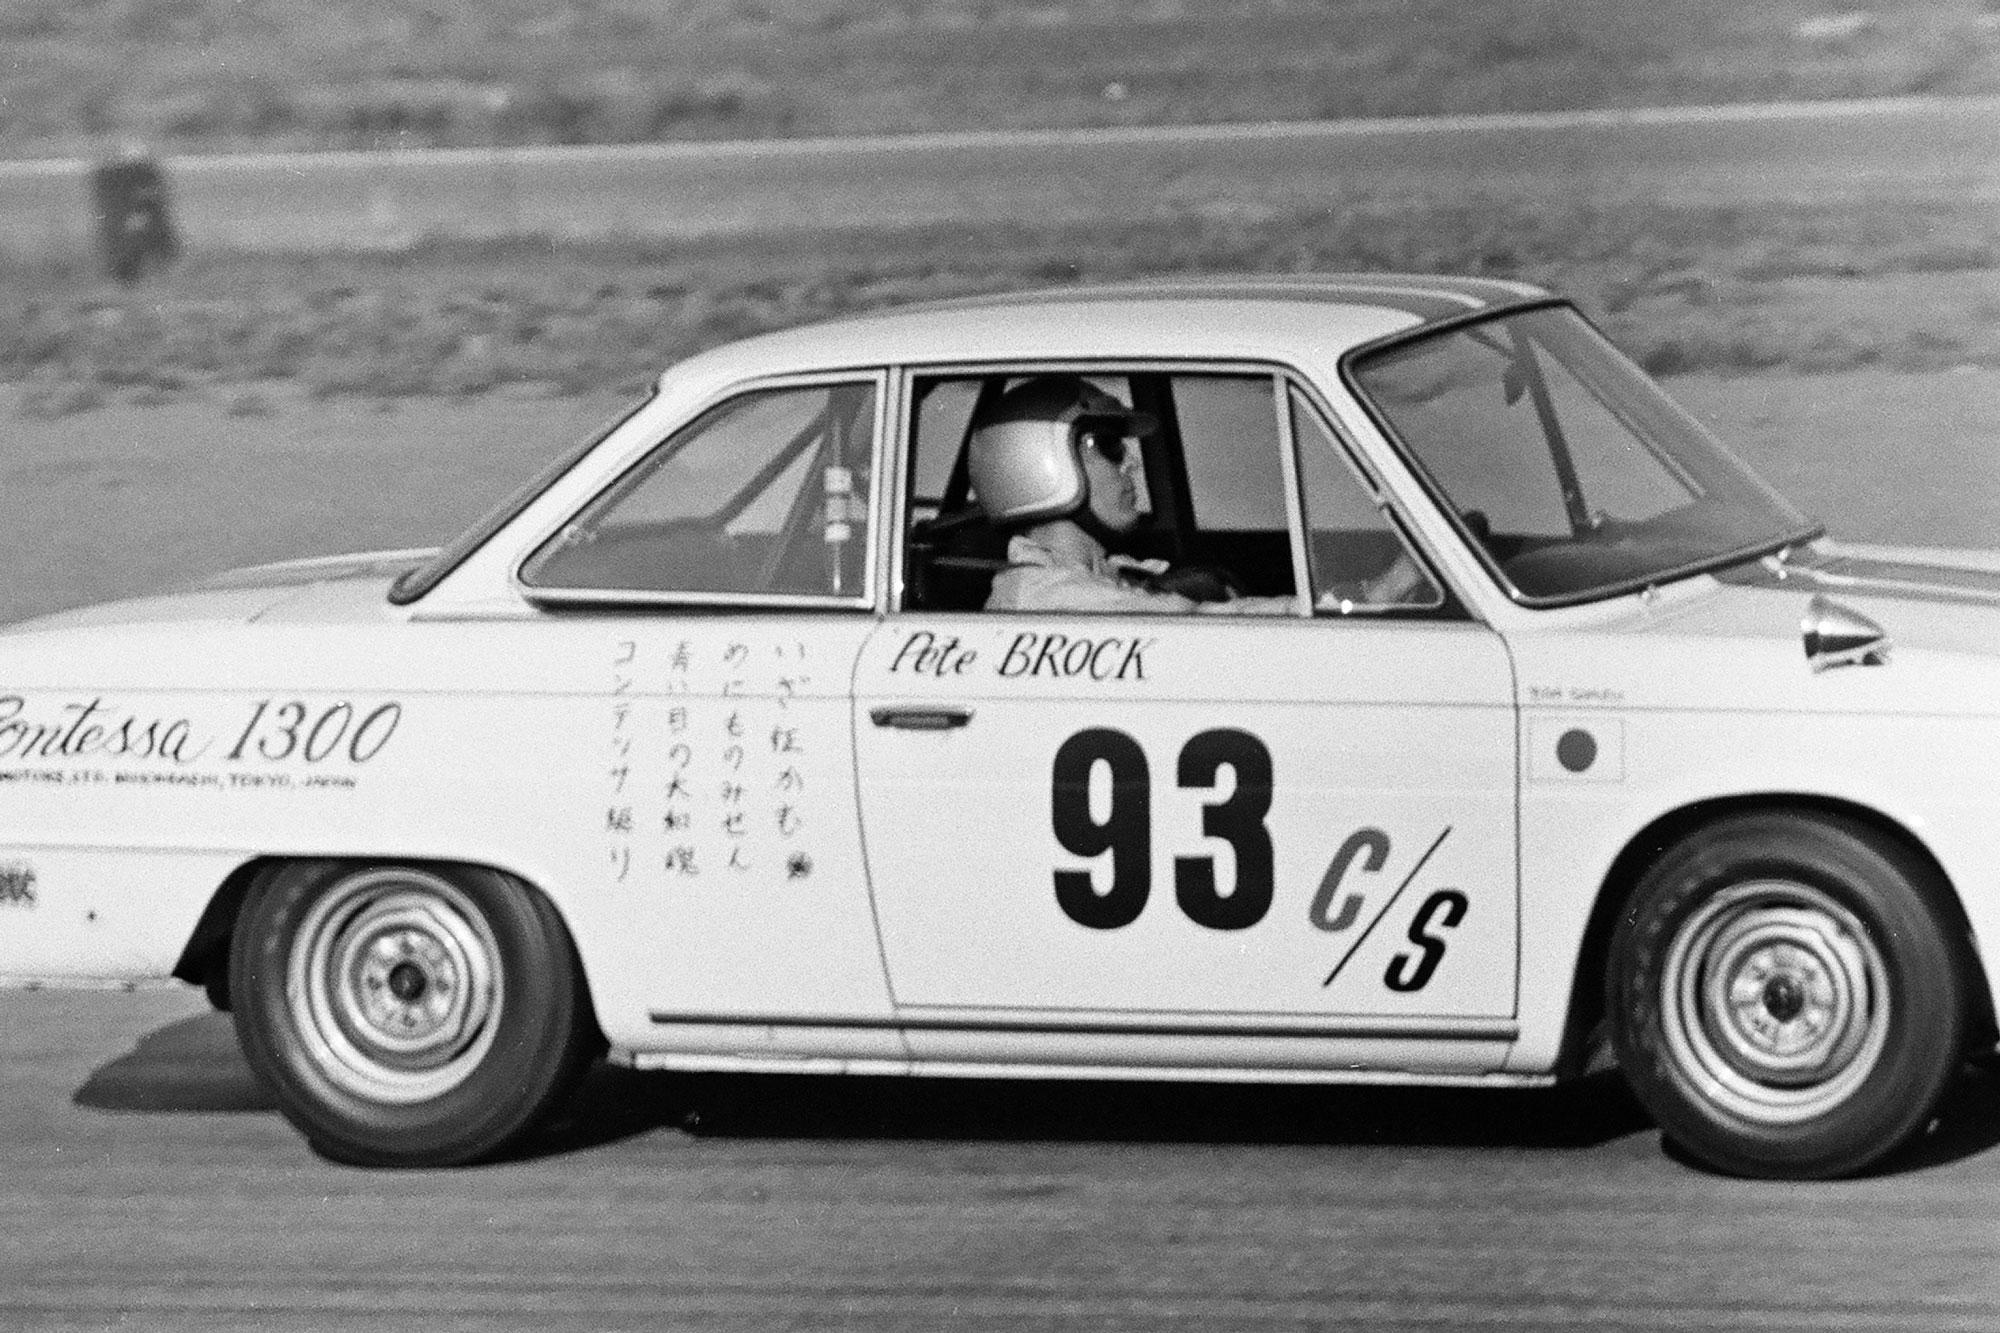 Contessa Pete Brock racing